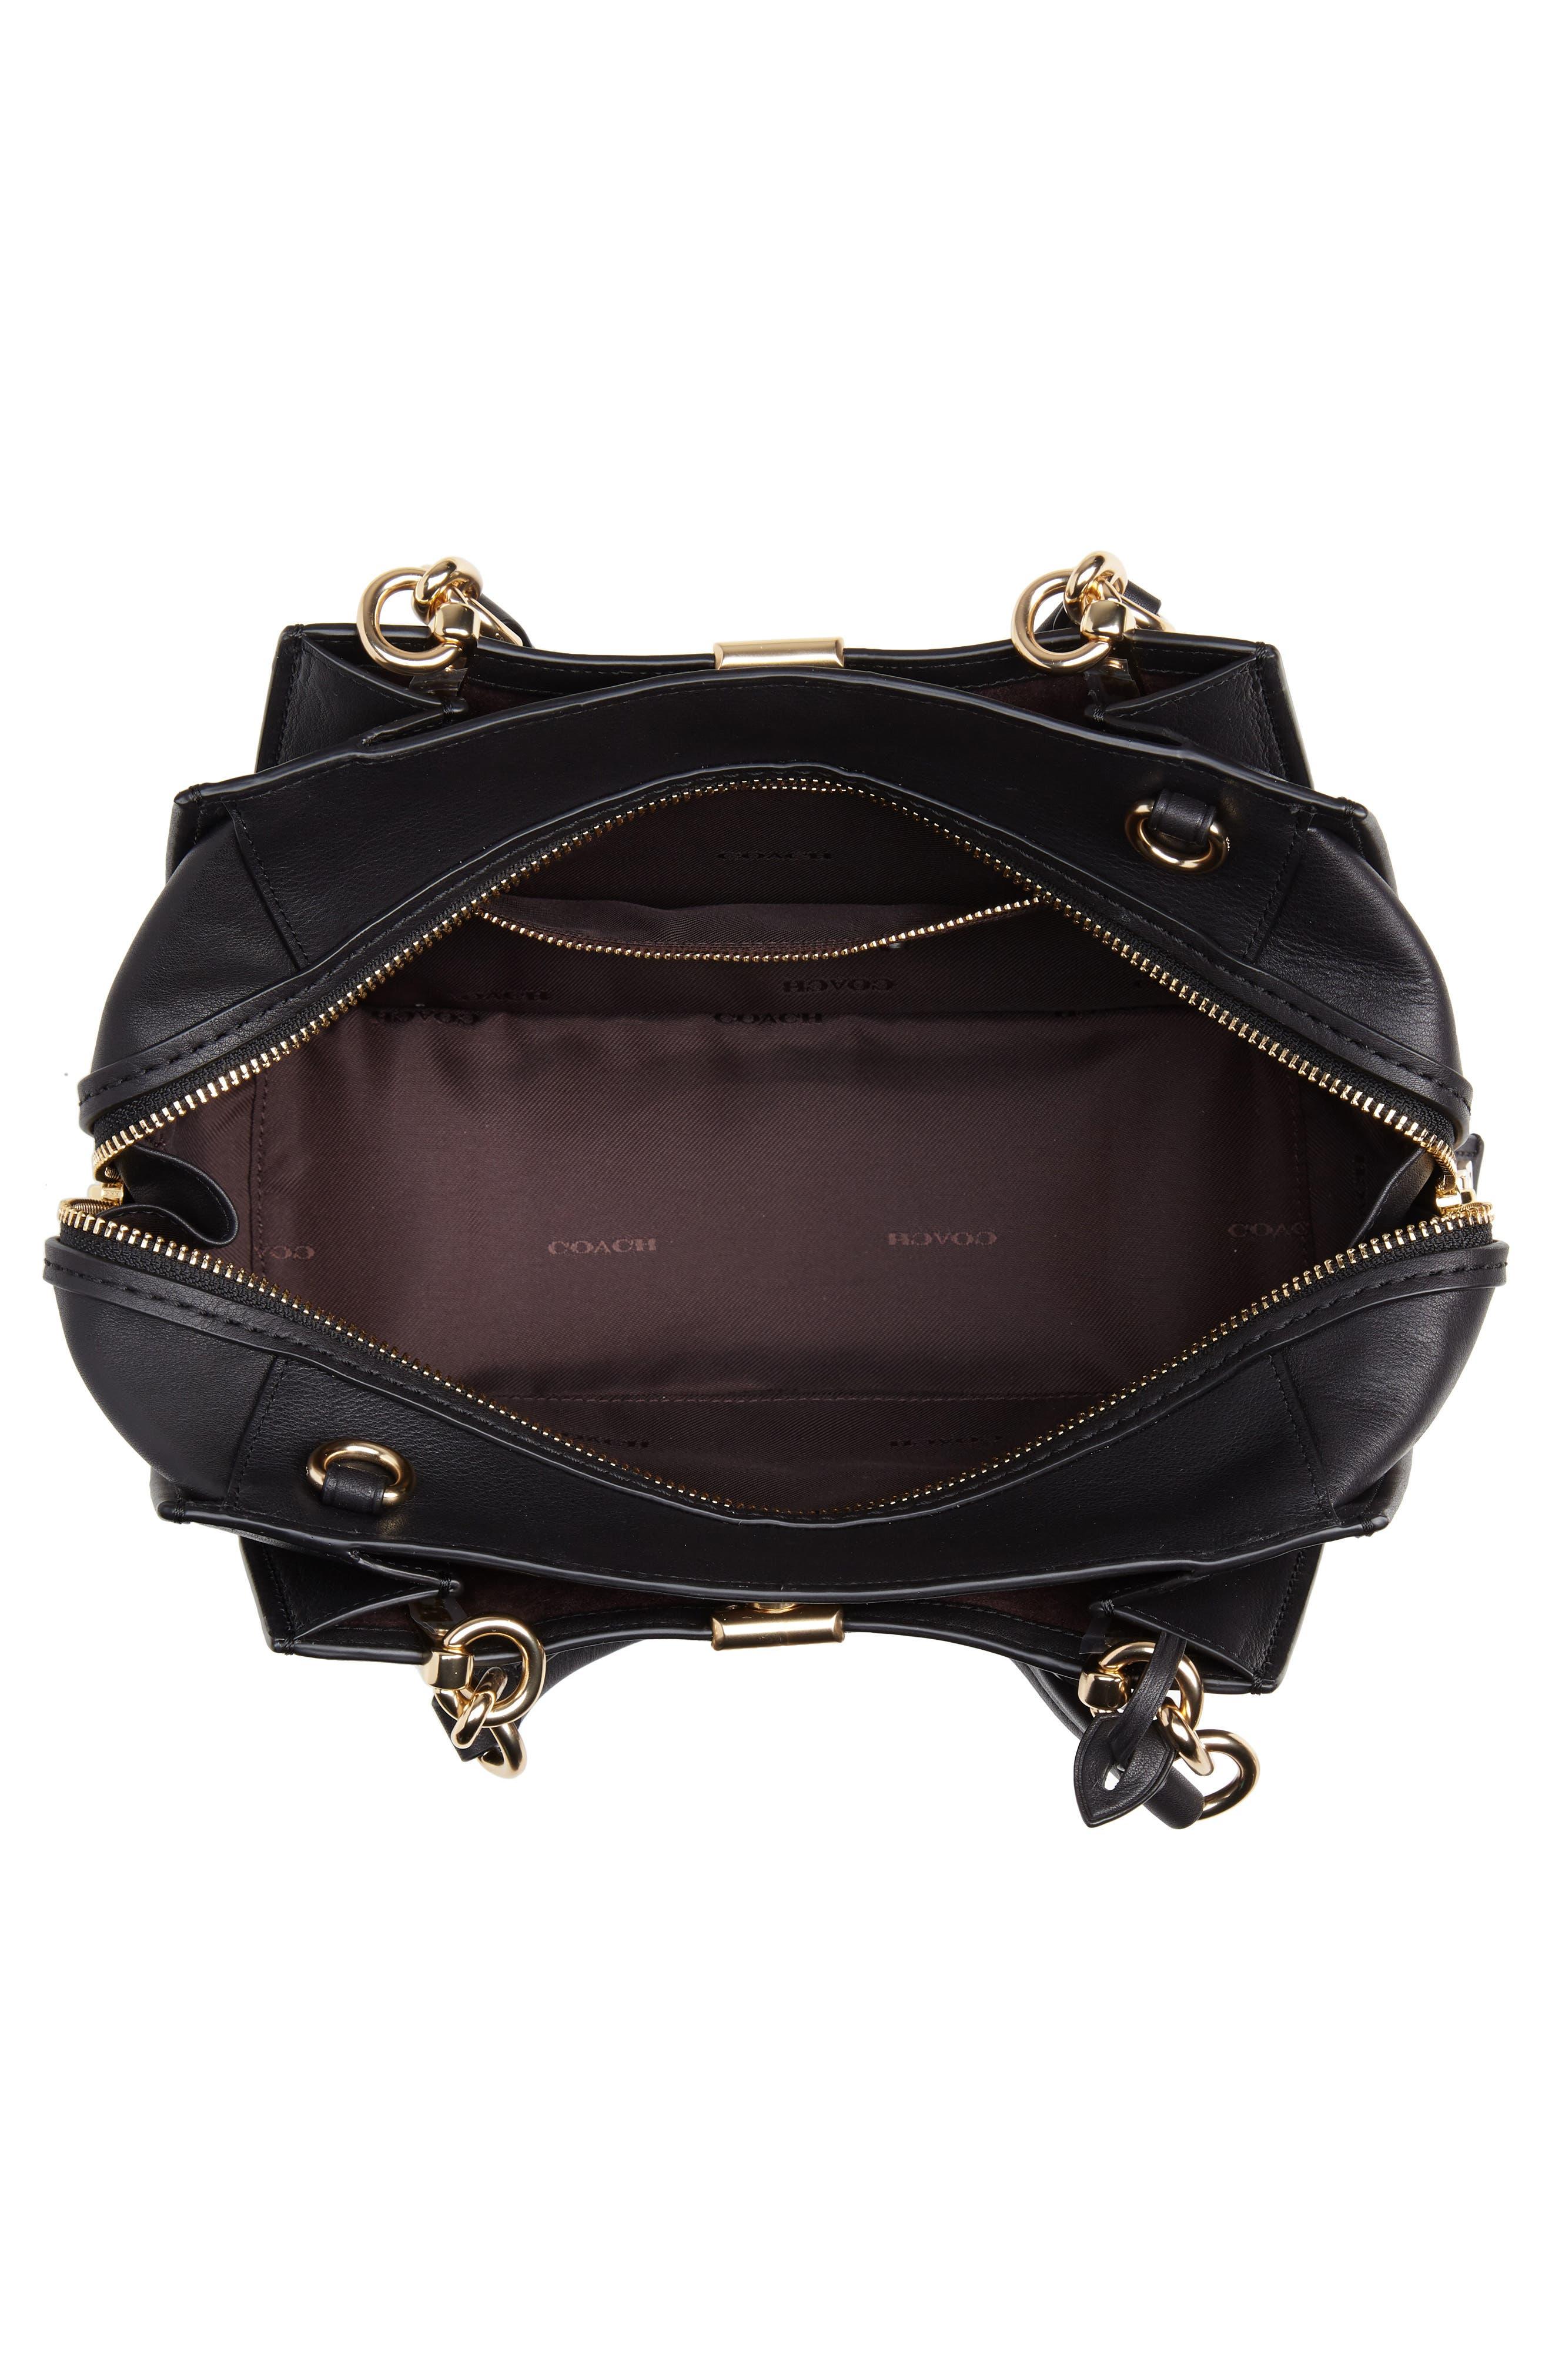 COACH,                             Dreamer Leather Bag,                             Alternate thumbnail 4, color,                             BLACK